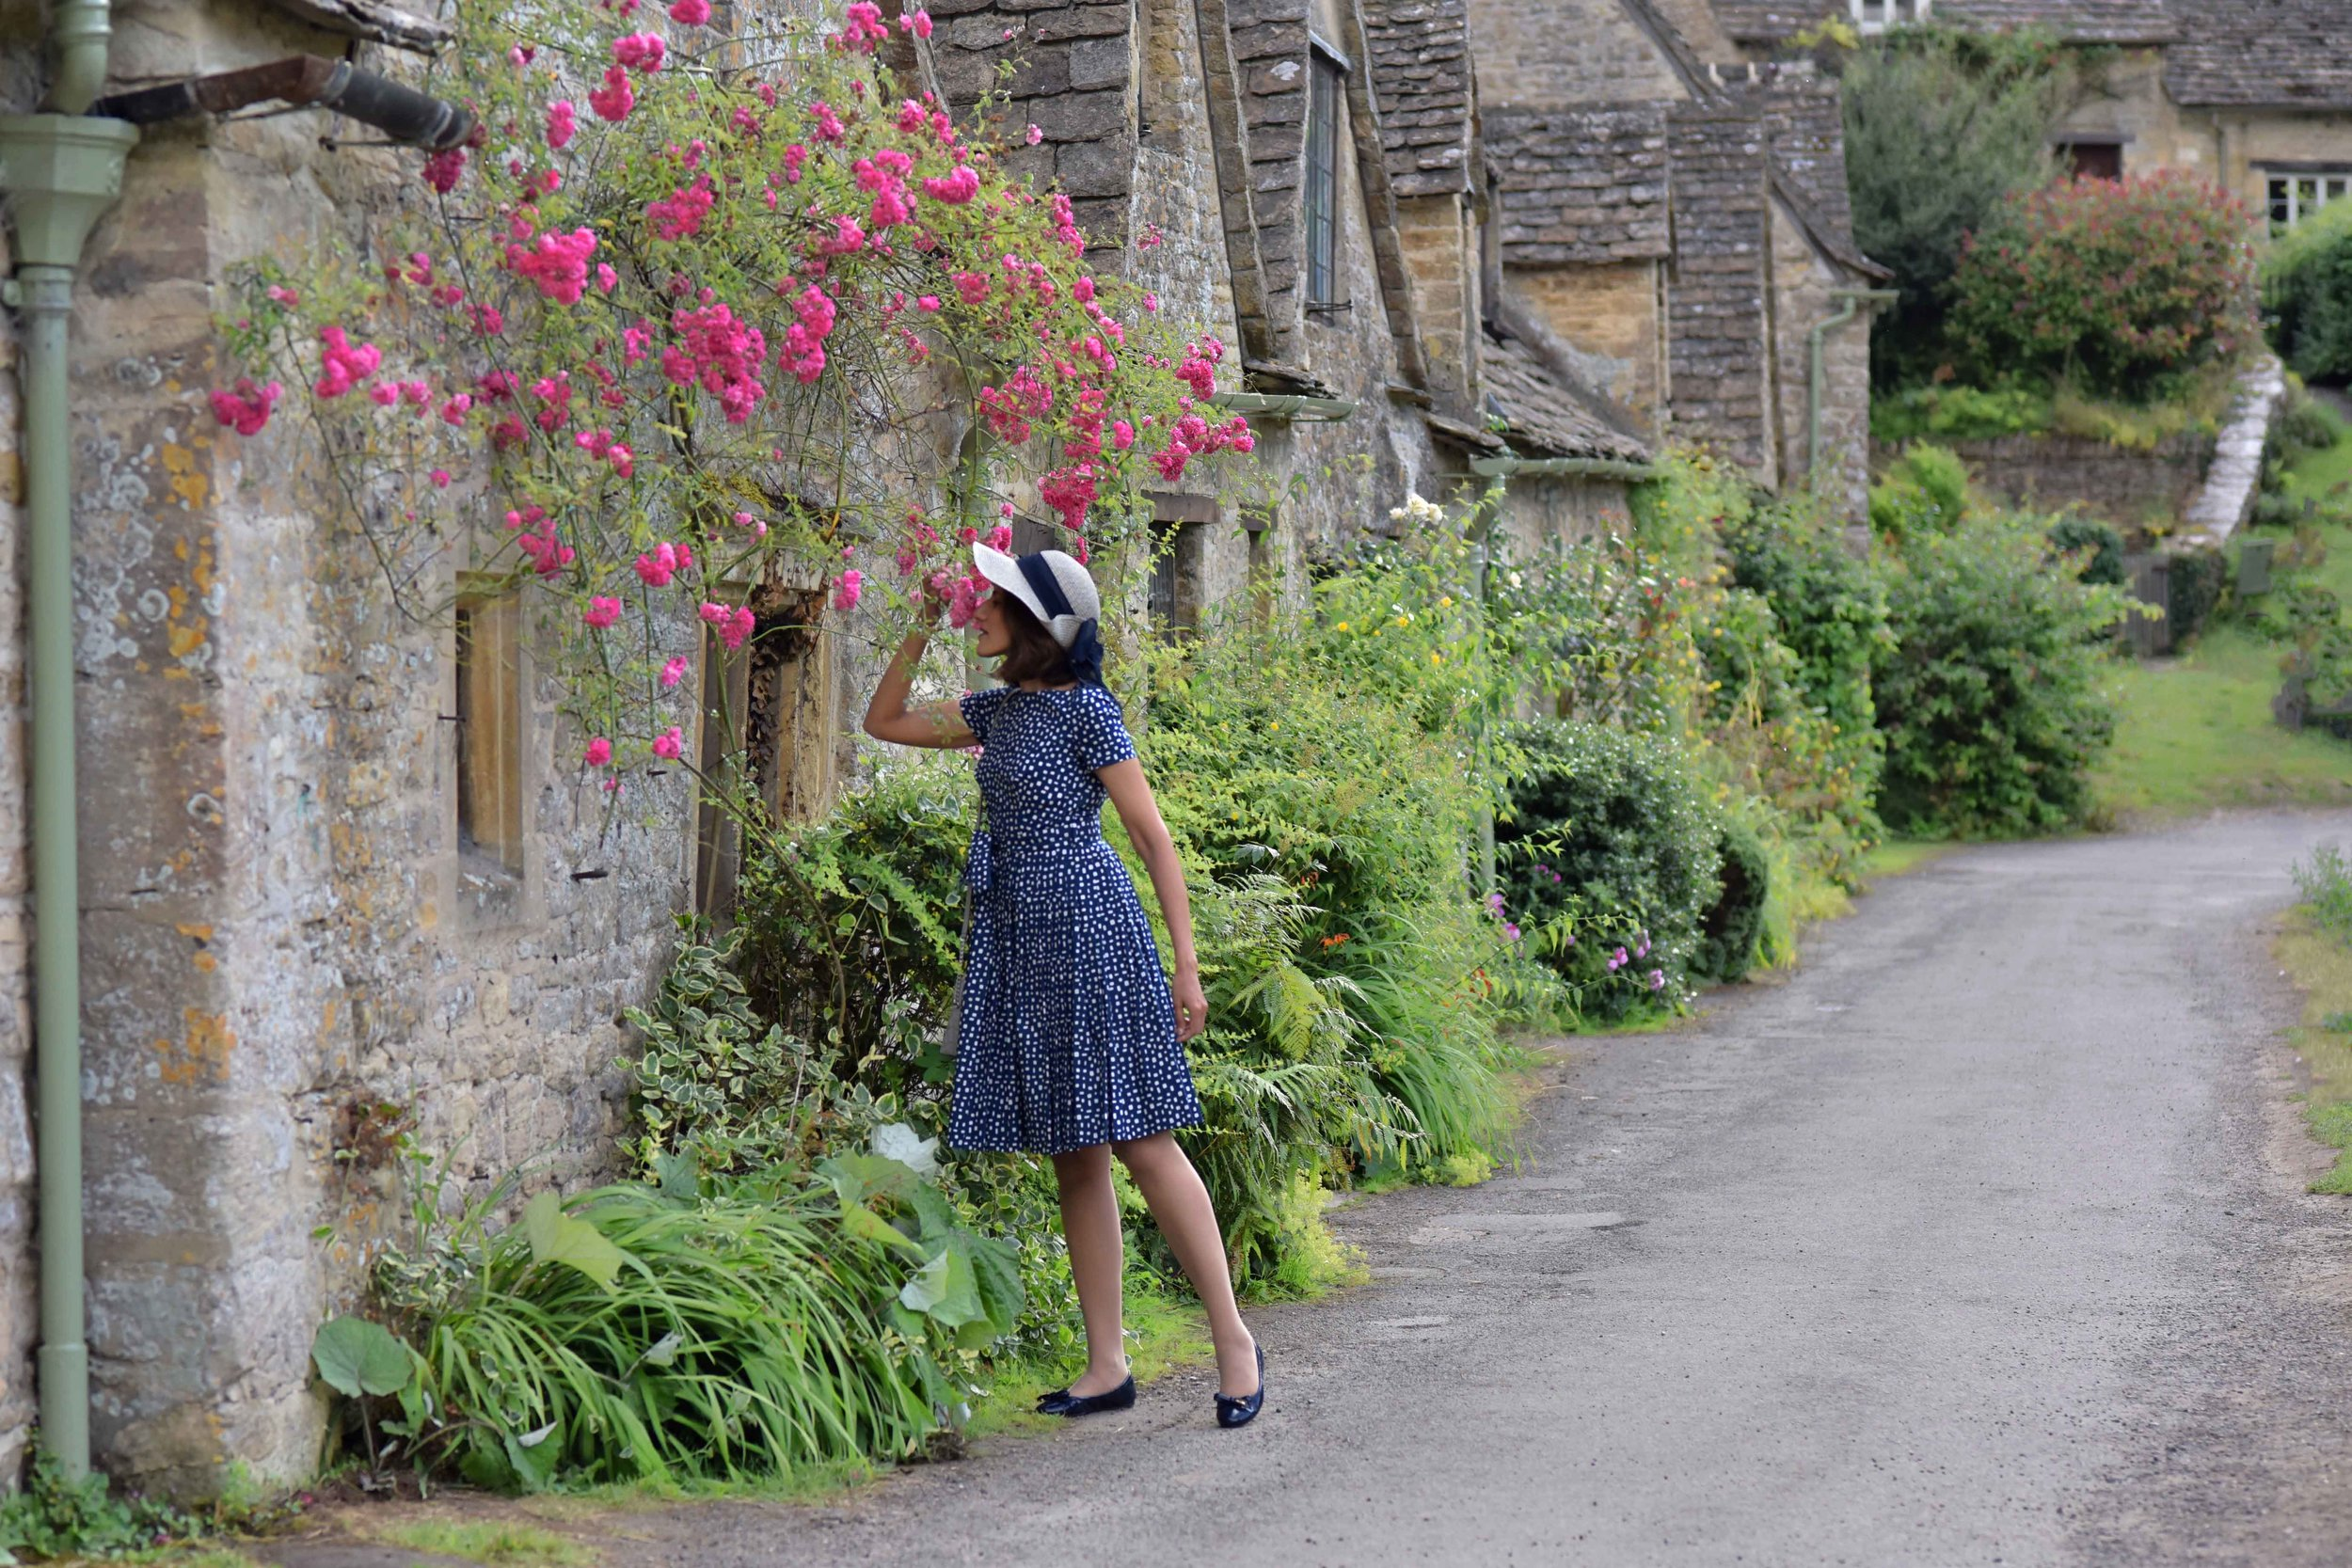 Prada dress, Prada ballet flats, Cotswold stone cottages, Arlington Row, Bibury, Cotswold, England. Image©sourcingstyle.com